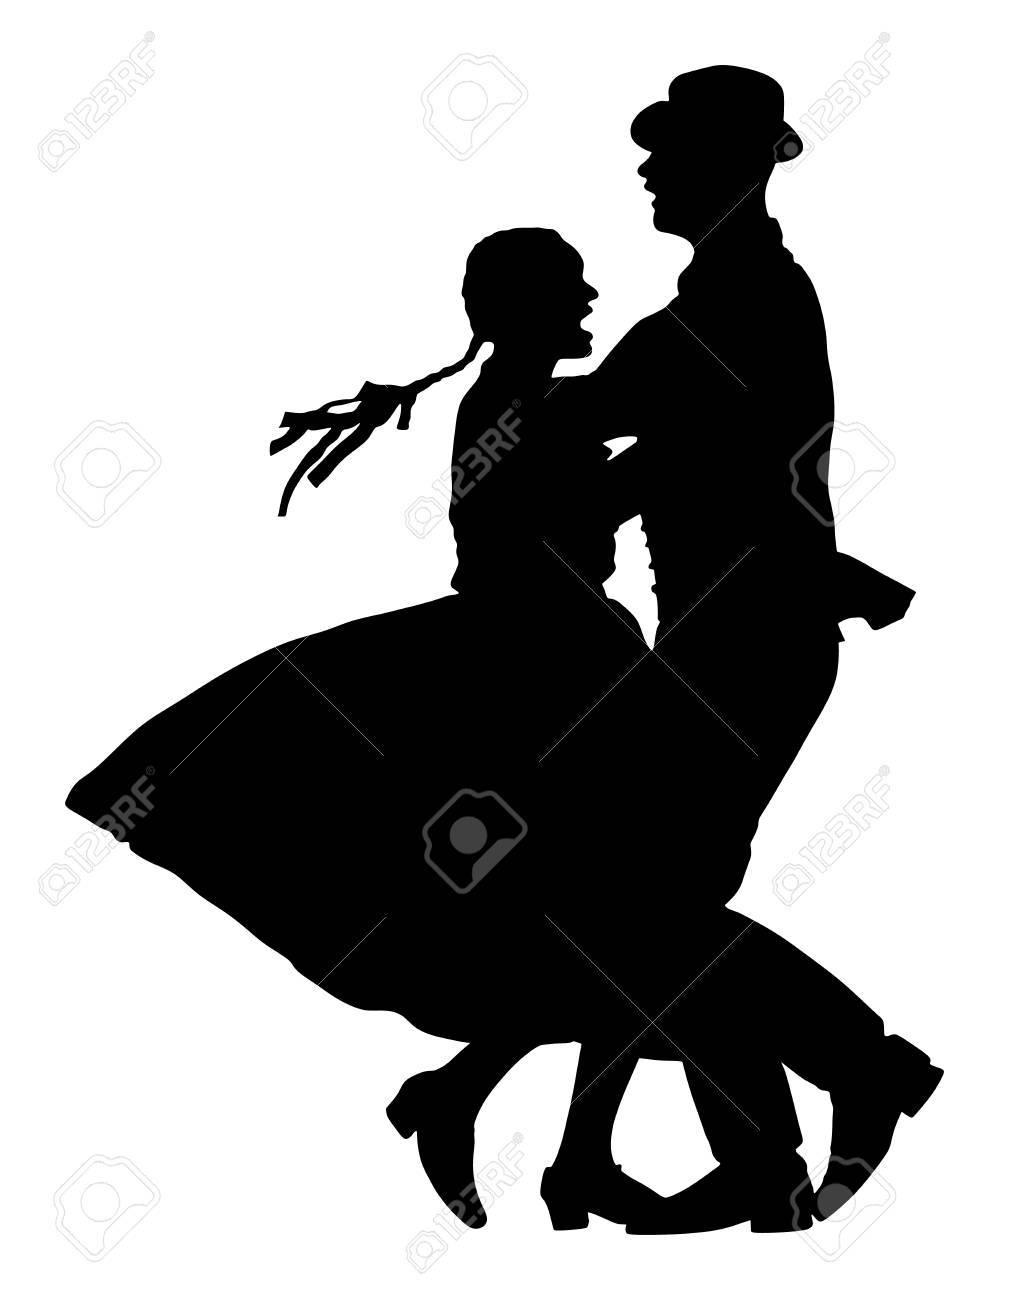 Couple dancer silhouette. - 89615304